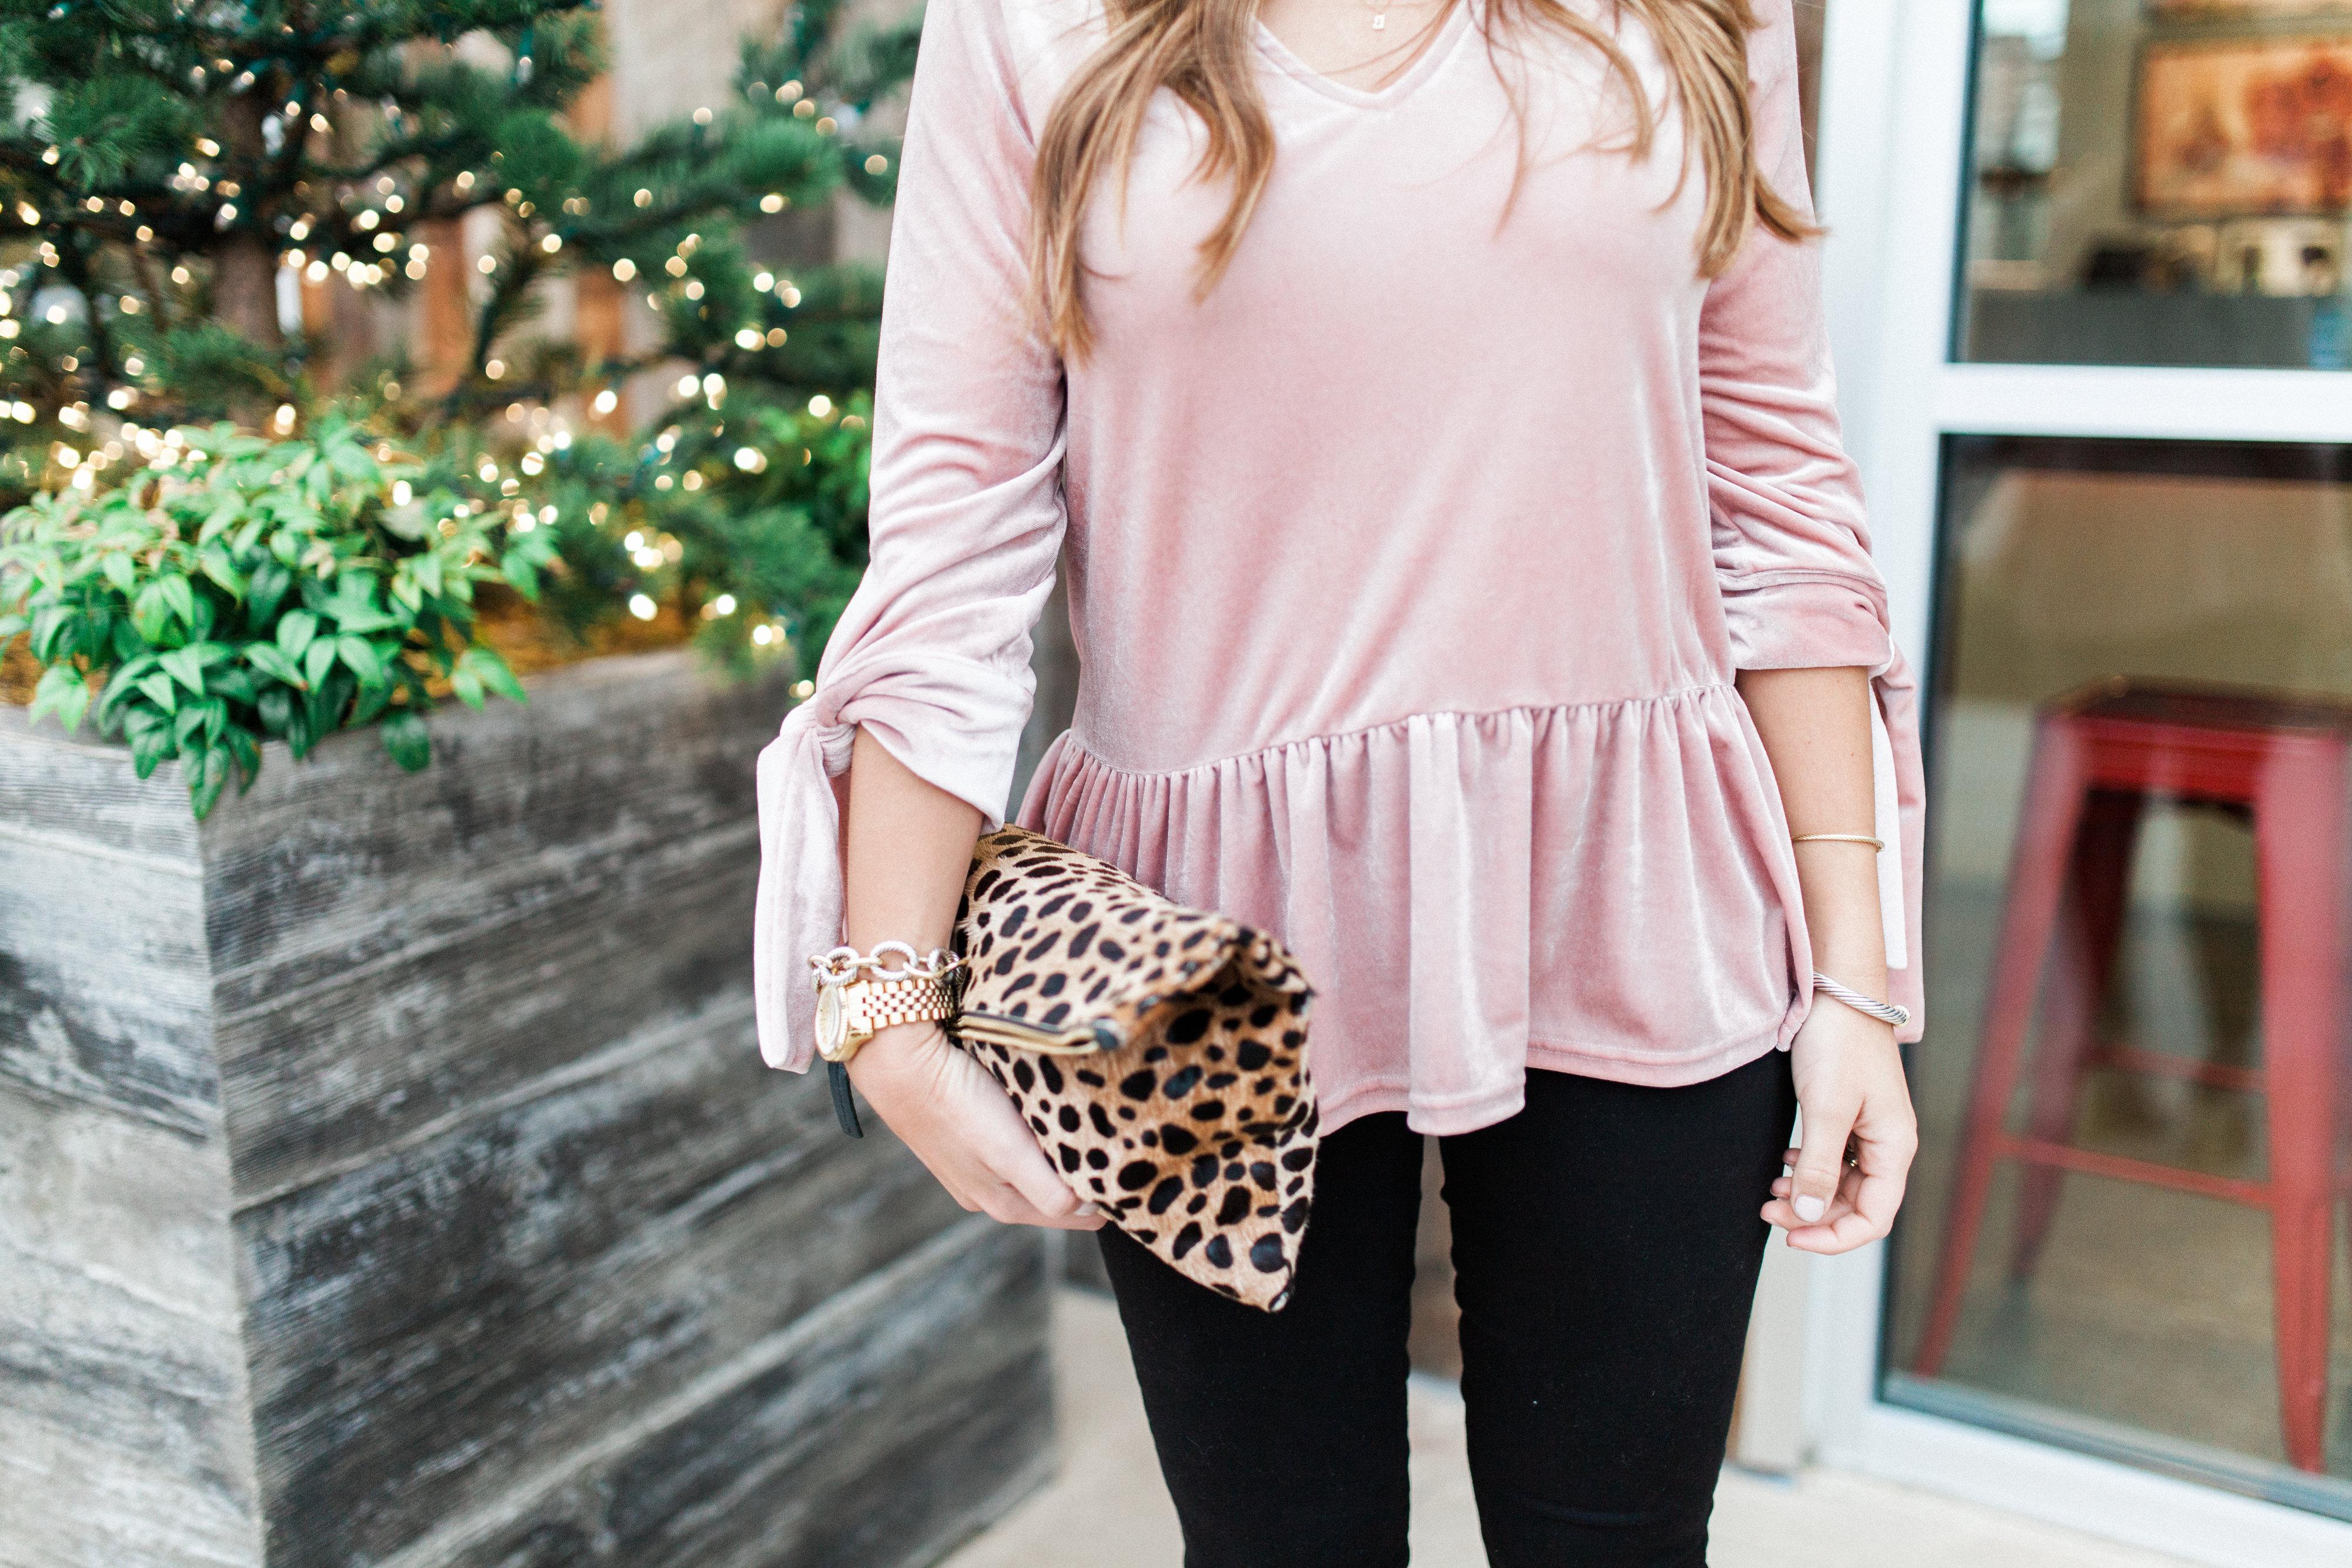 Velvet Peplum Top / Holiday Outfit Idea